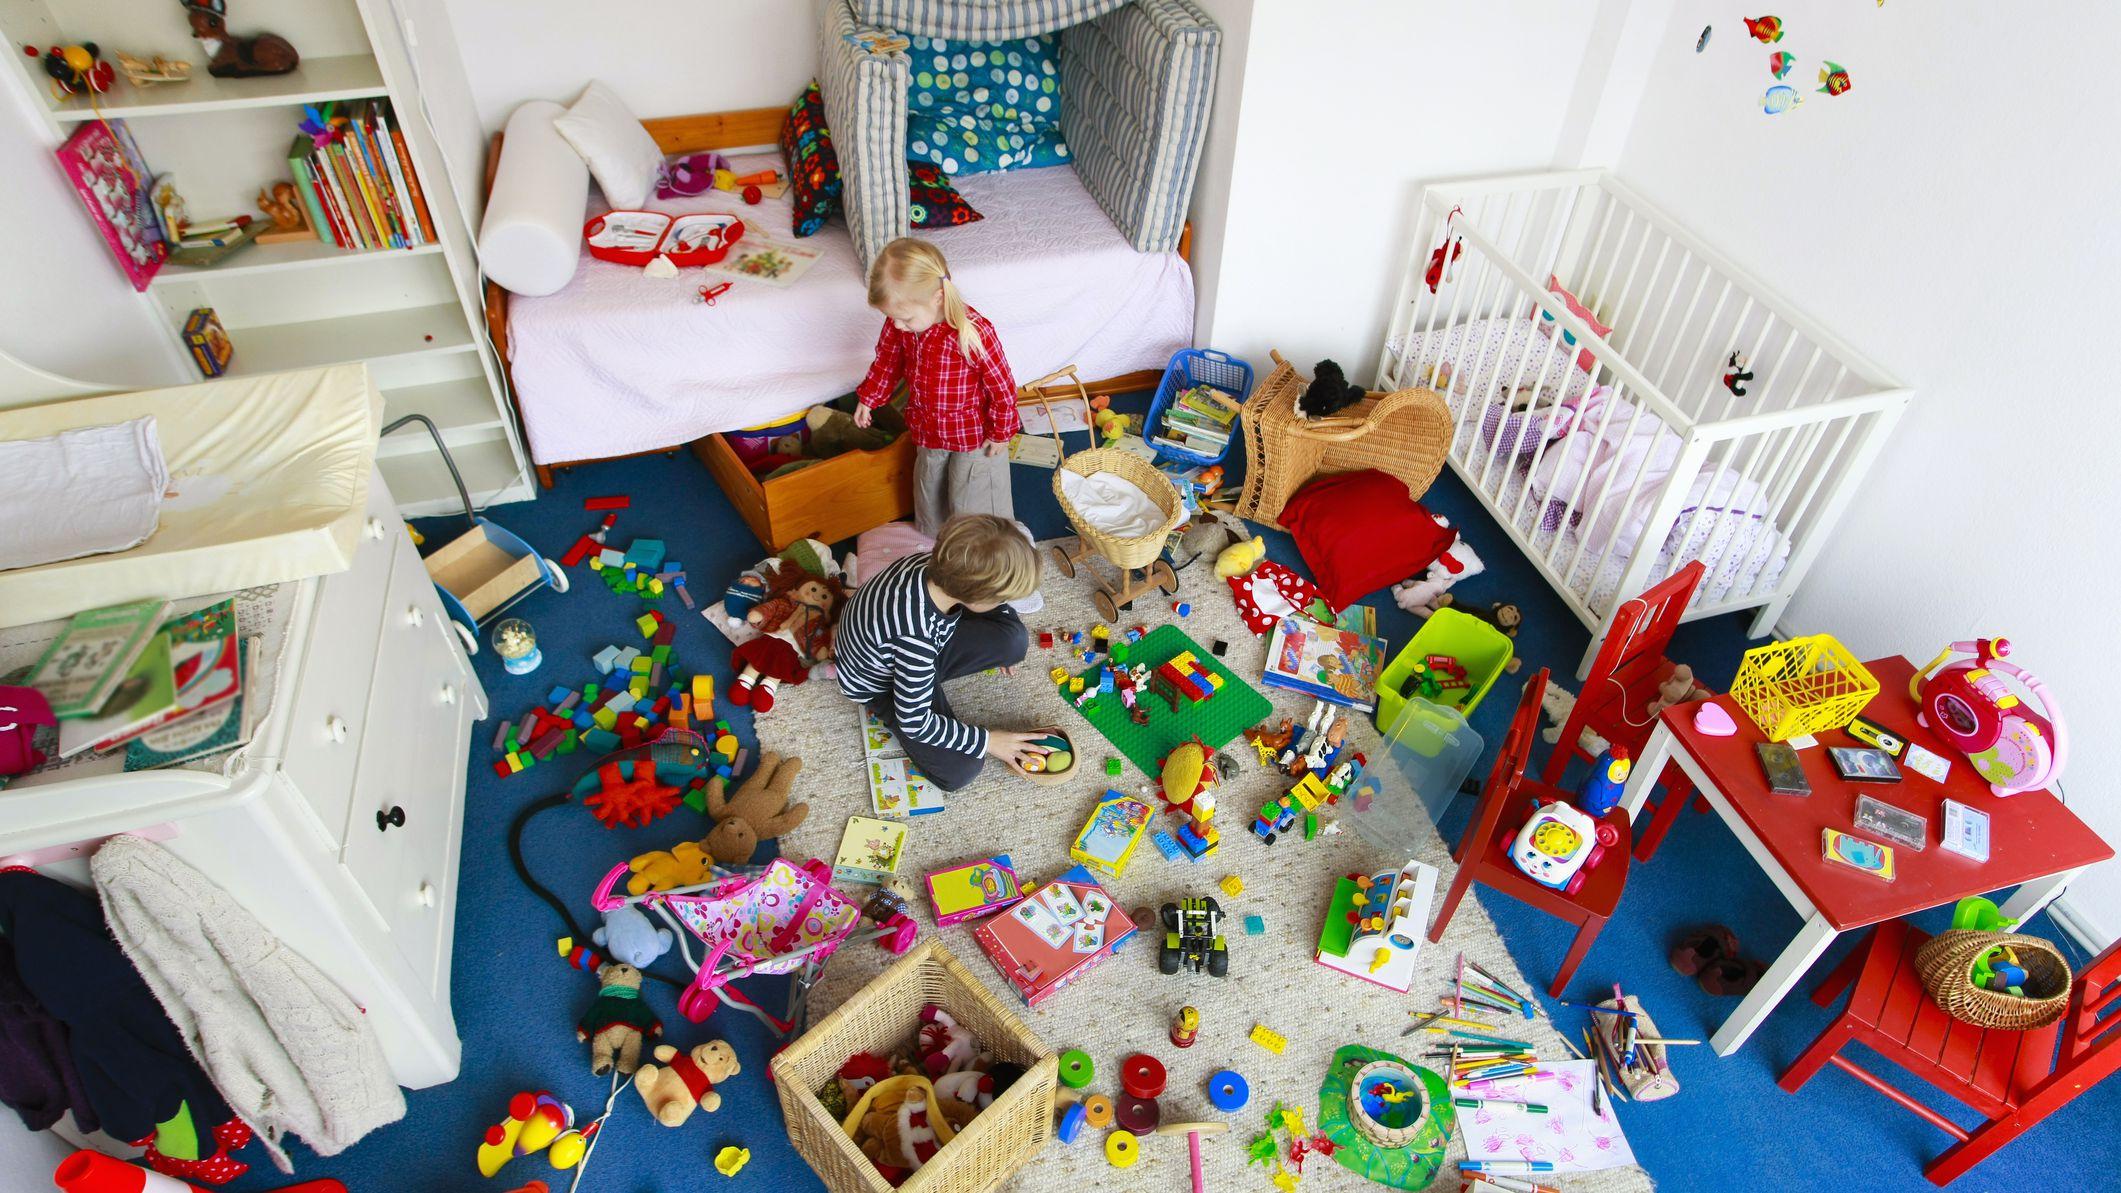 Less Toys, More Joy: How to Avoid Having too Many Toys